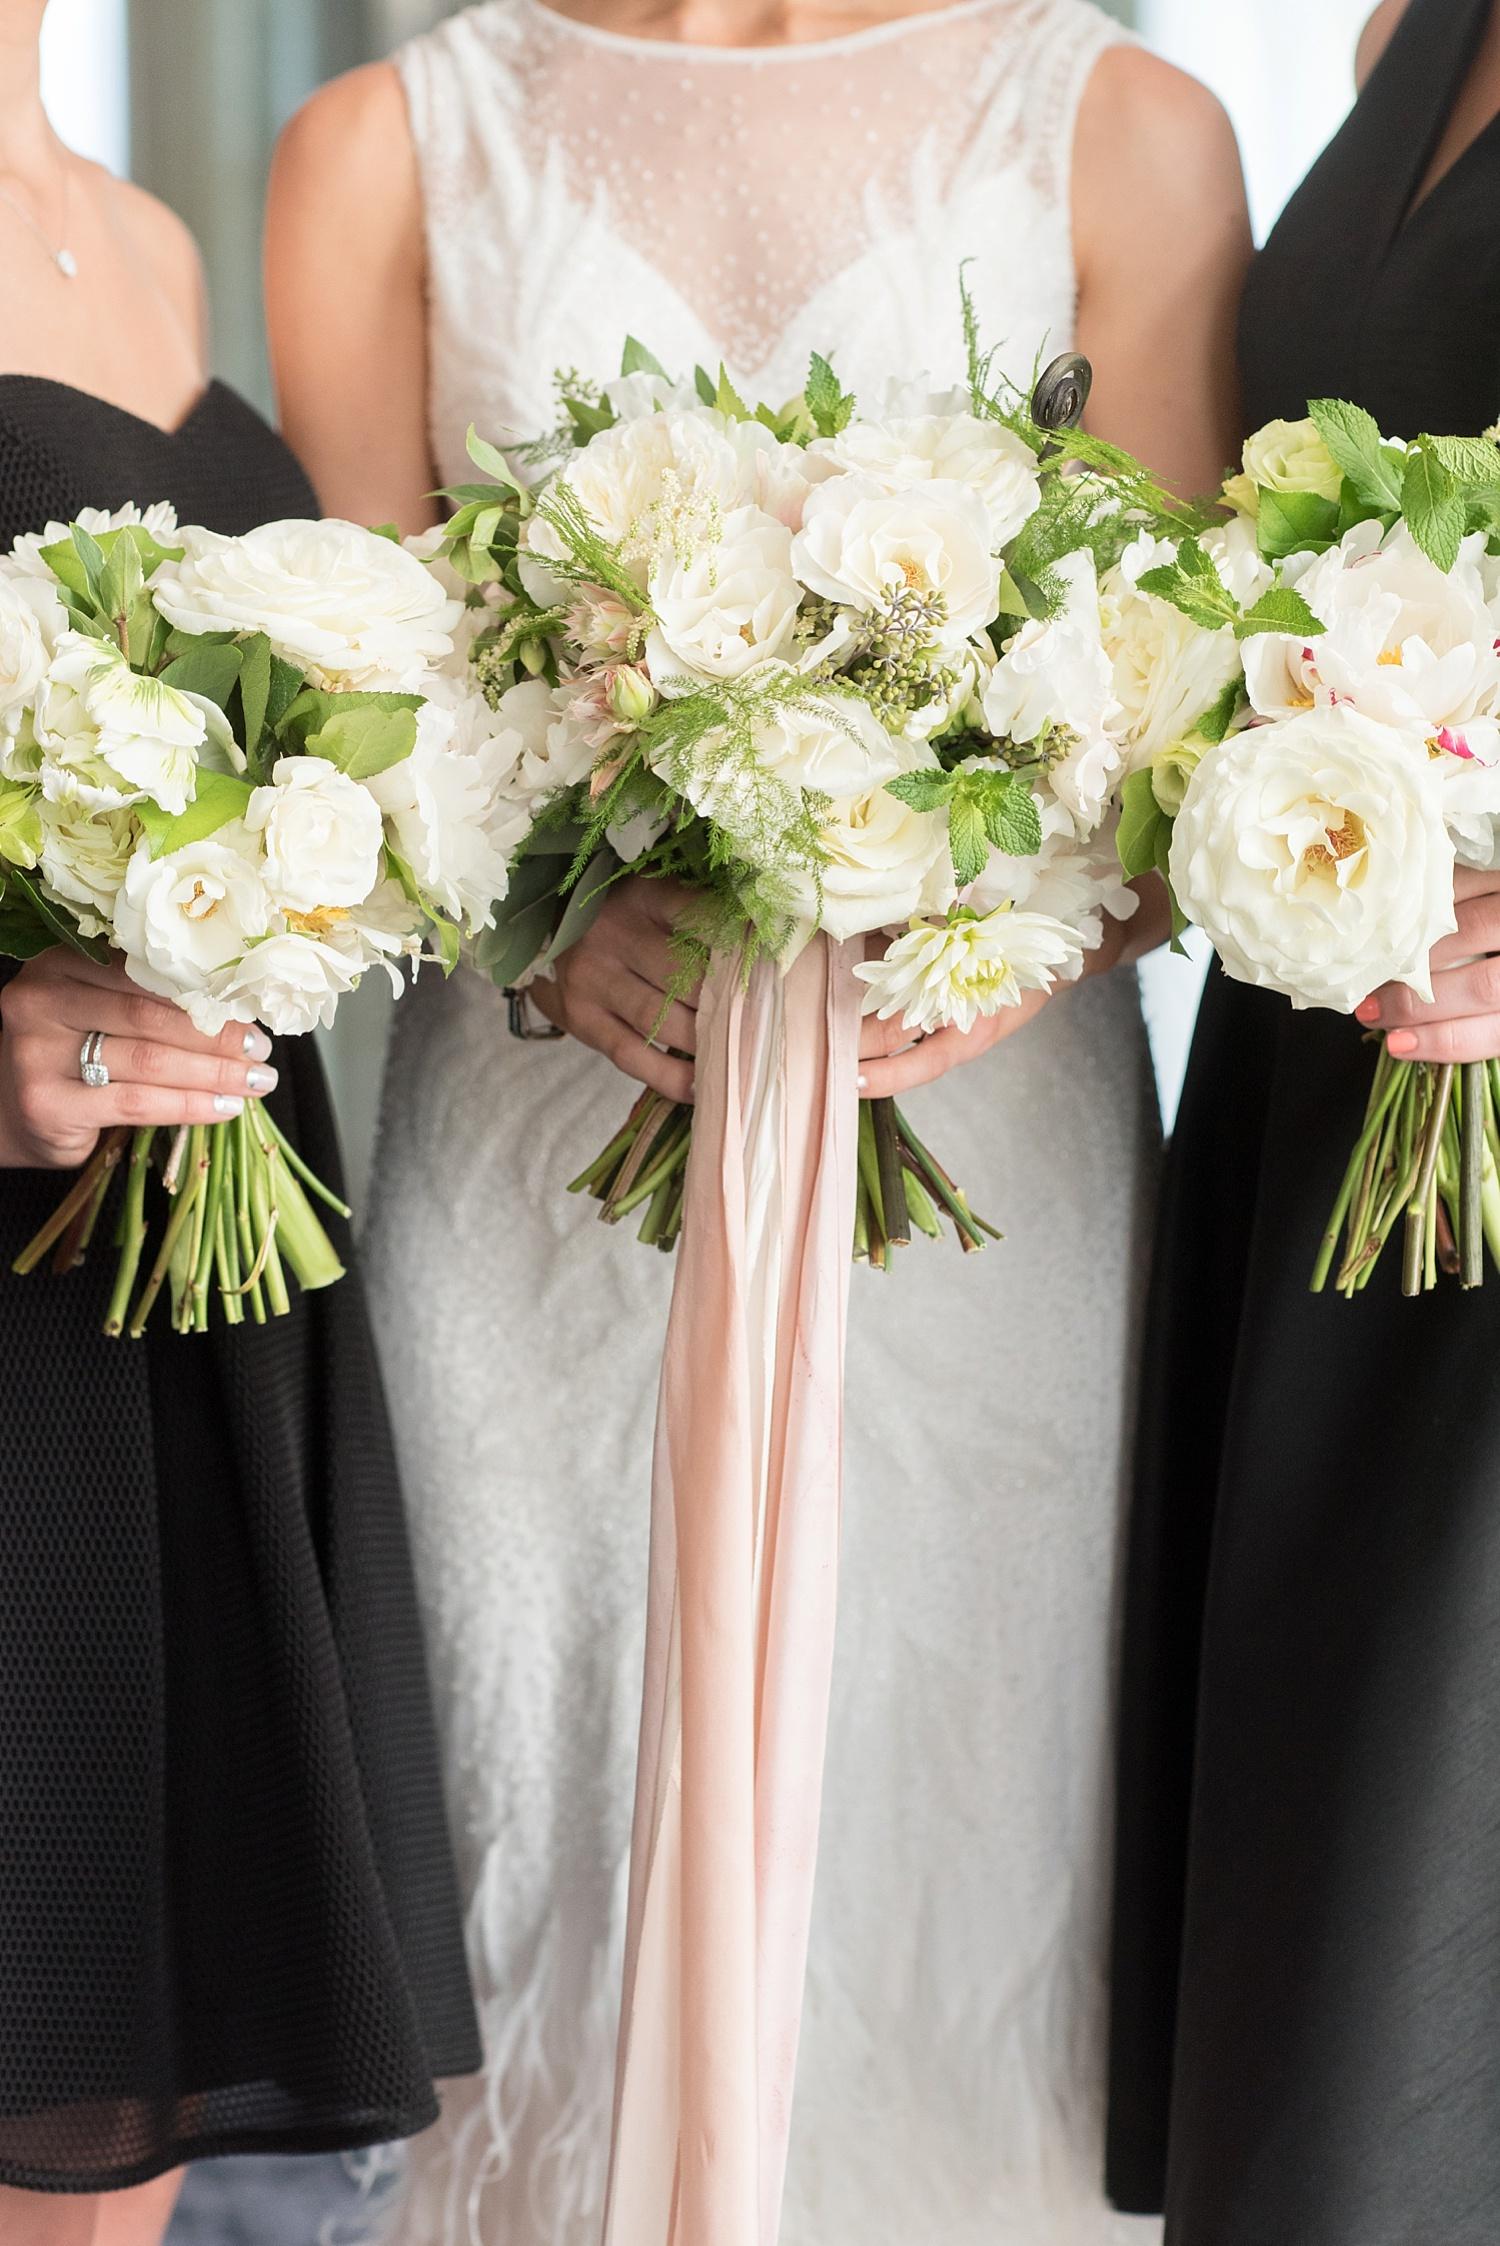 mikkelpaige-full_aperture_floral-pearl_river_hilton_wedding_0019.jpg